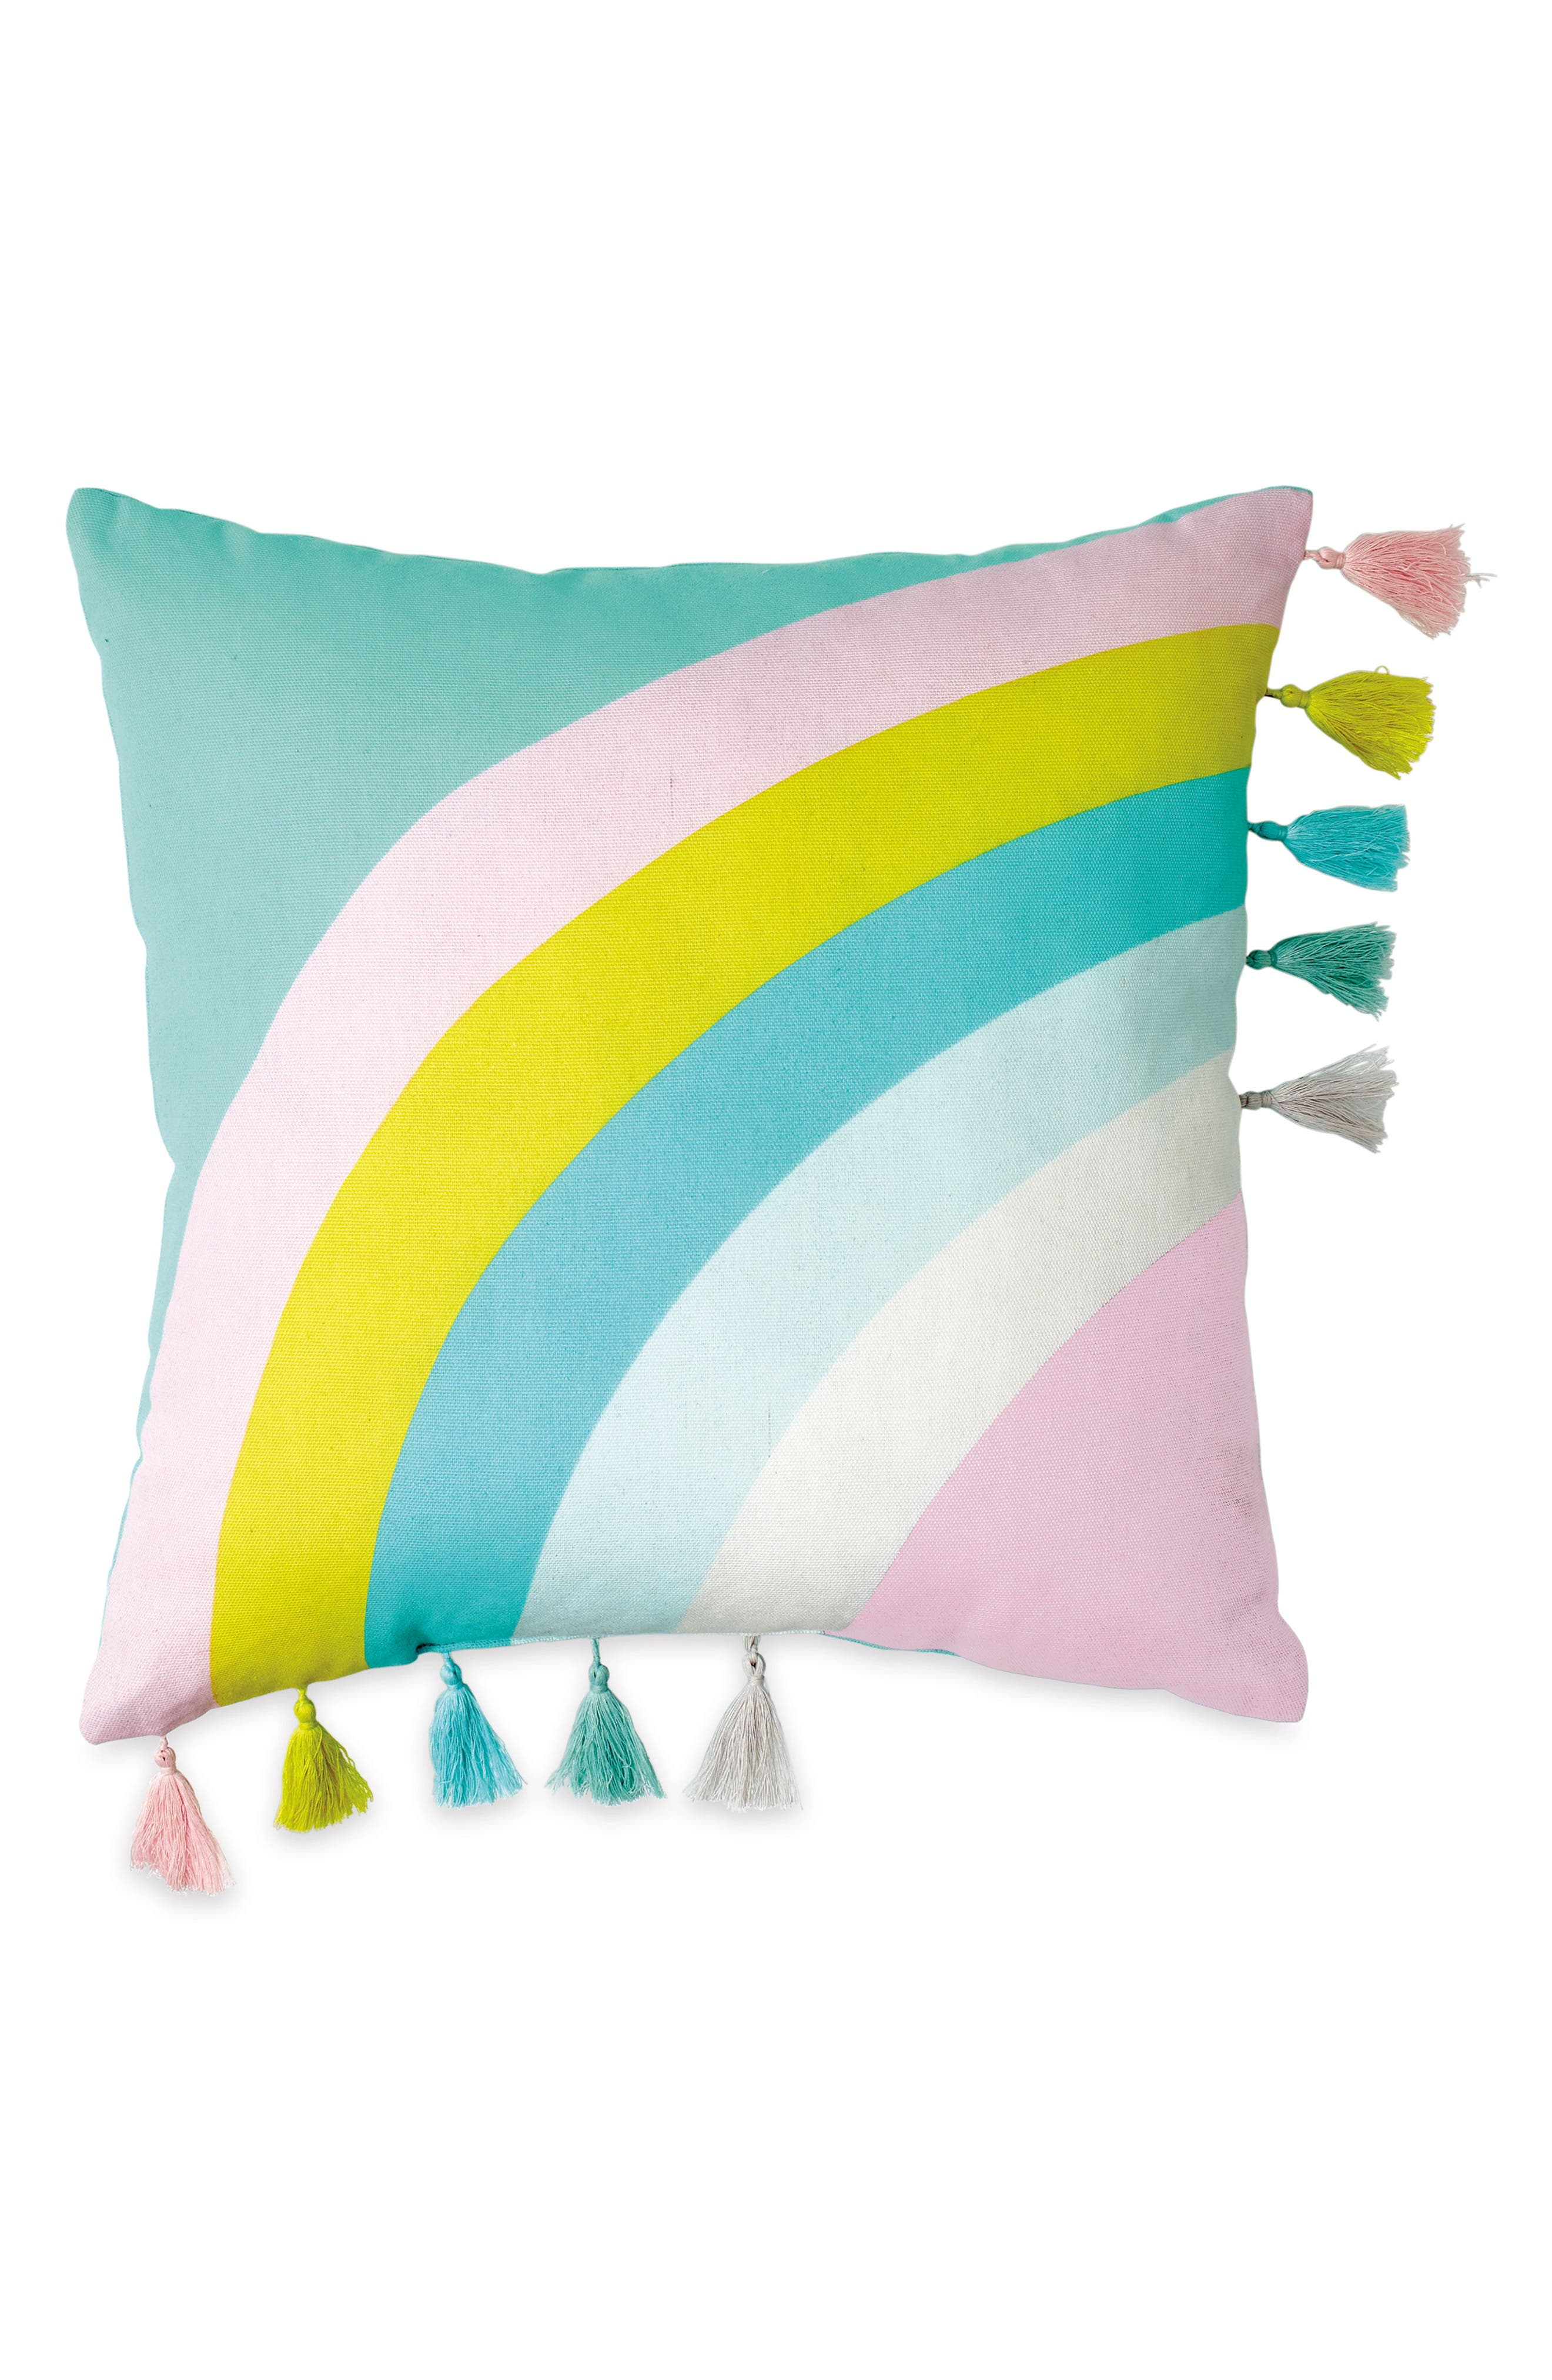 DKNY, Over the Moon Duvet, Sham & Accent Pillow Set, Alternate thumbnail 4, color, PURPLE